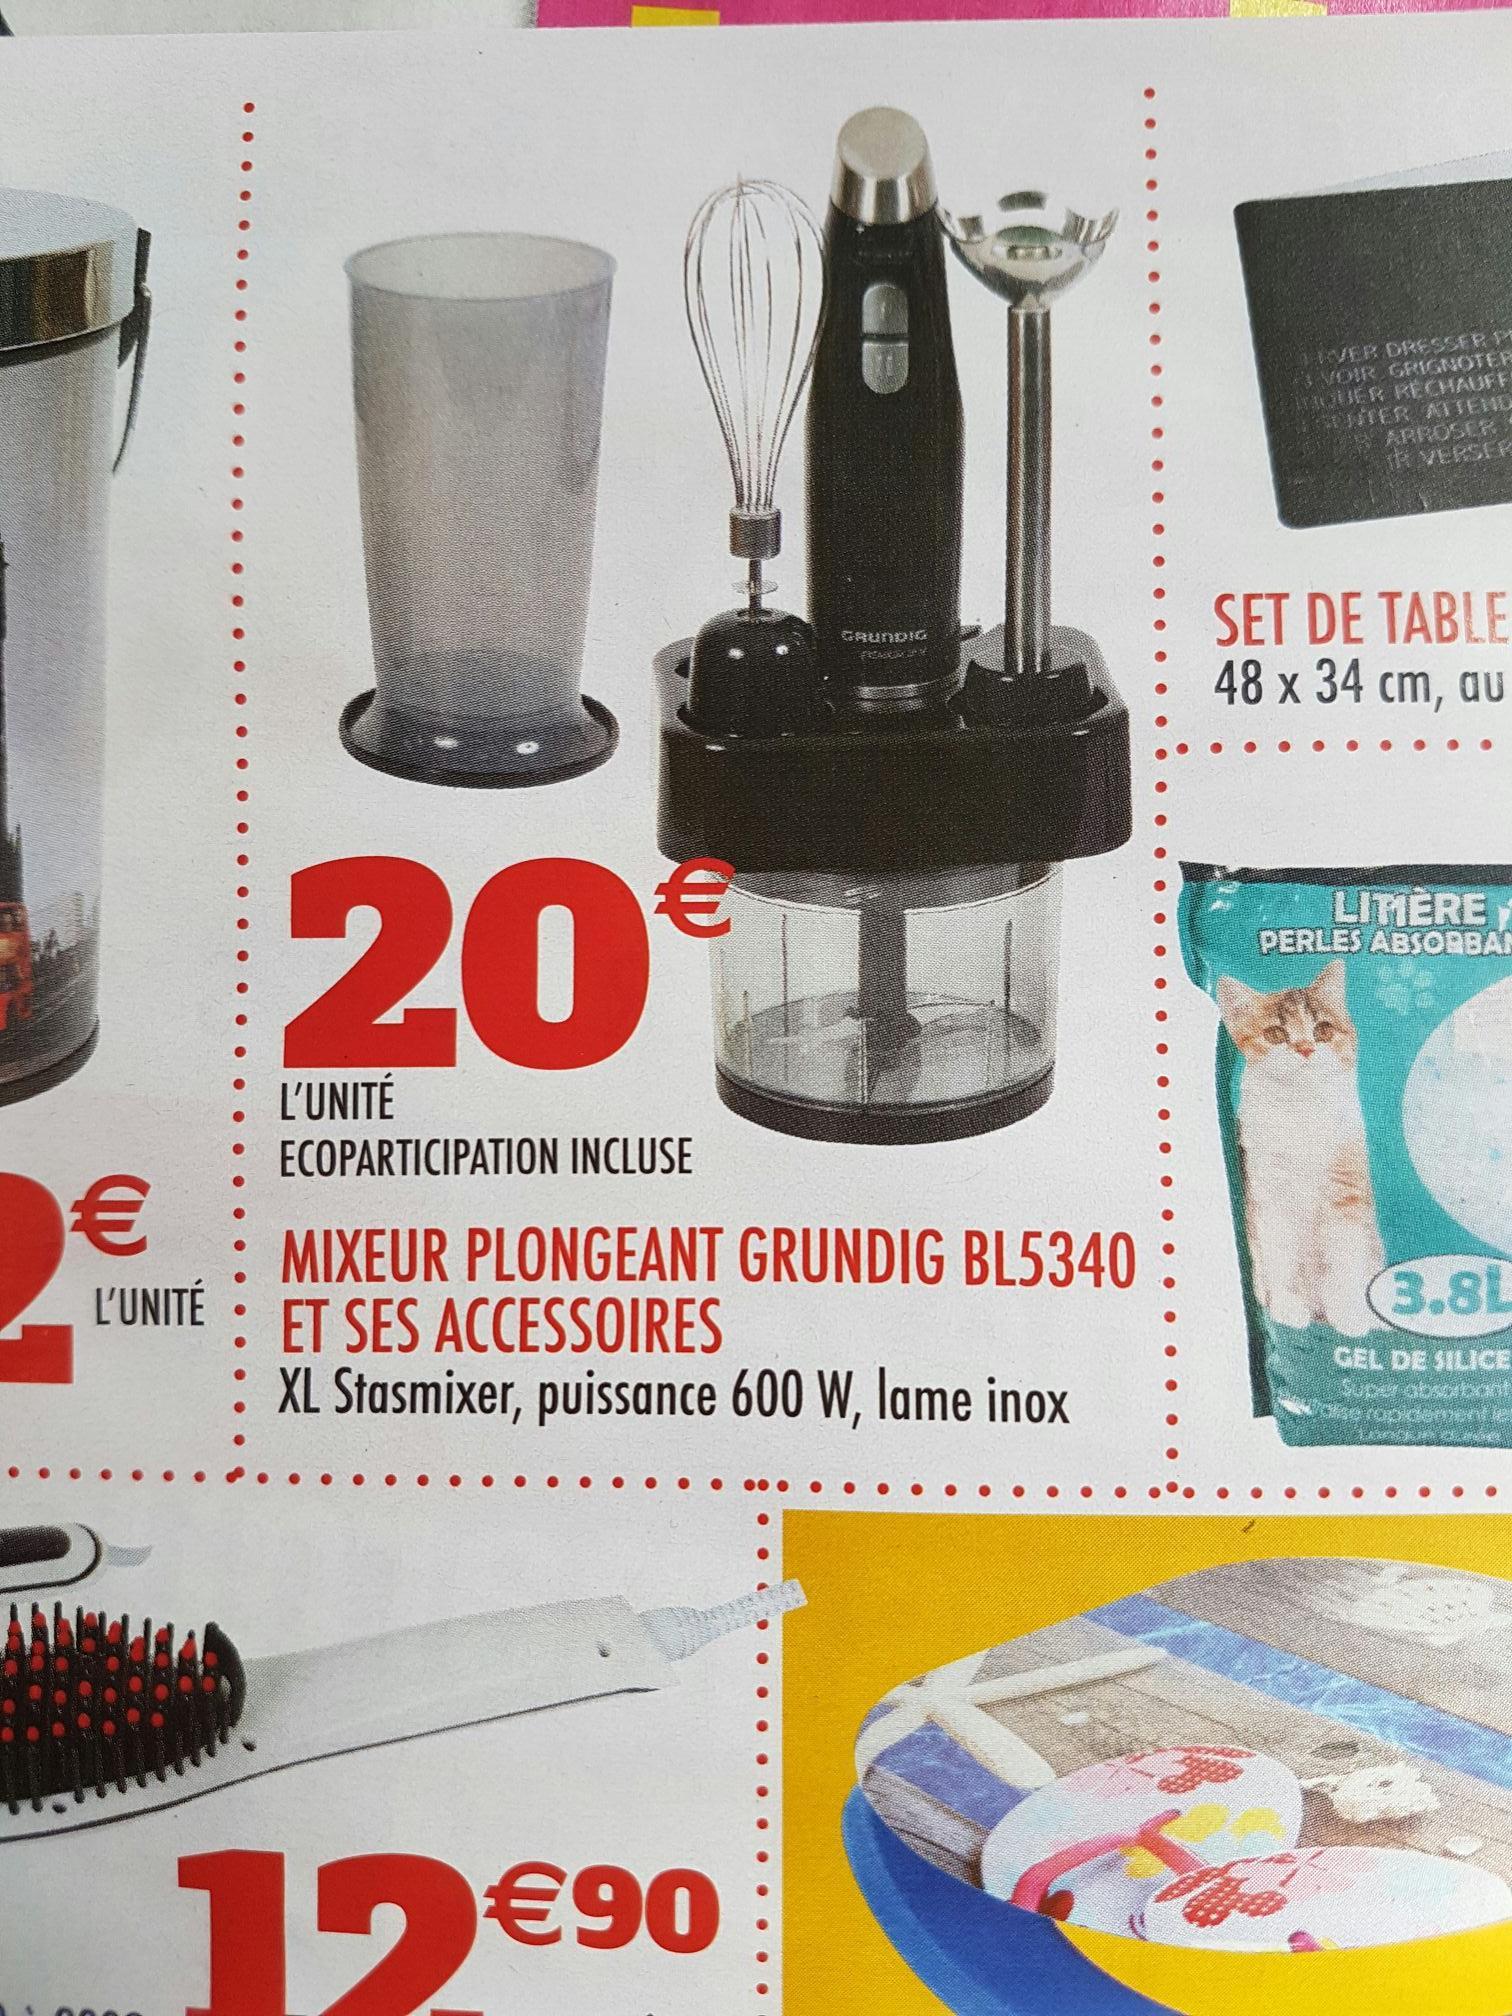 Mixeur plongeant Grundig BL5340 - 600W